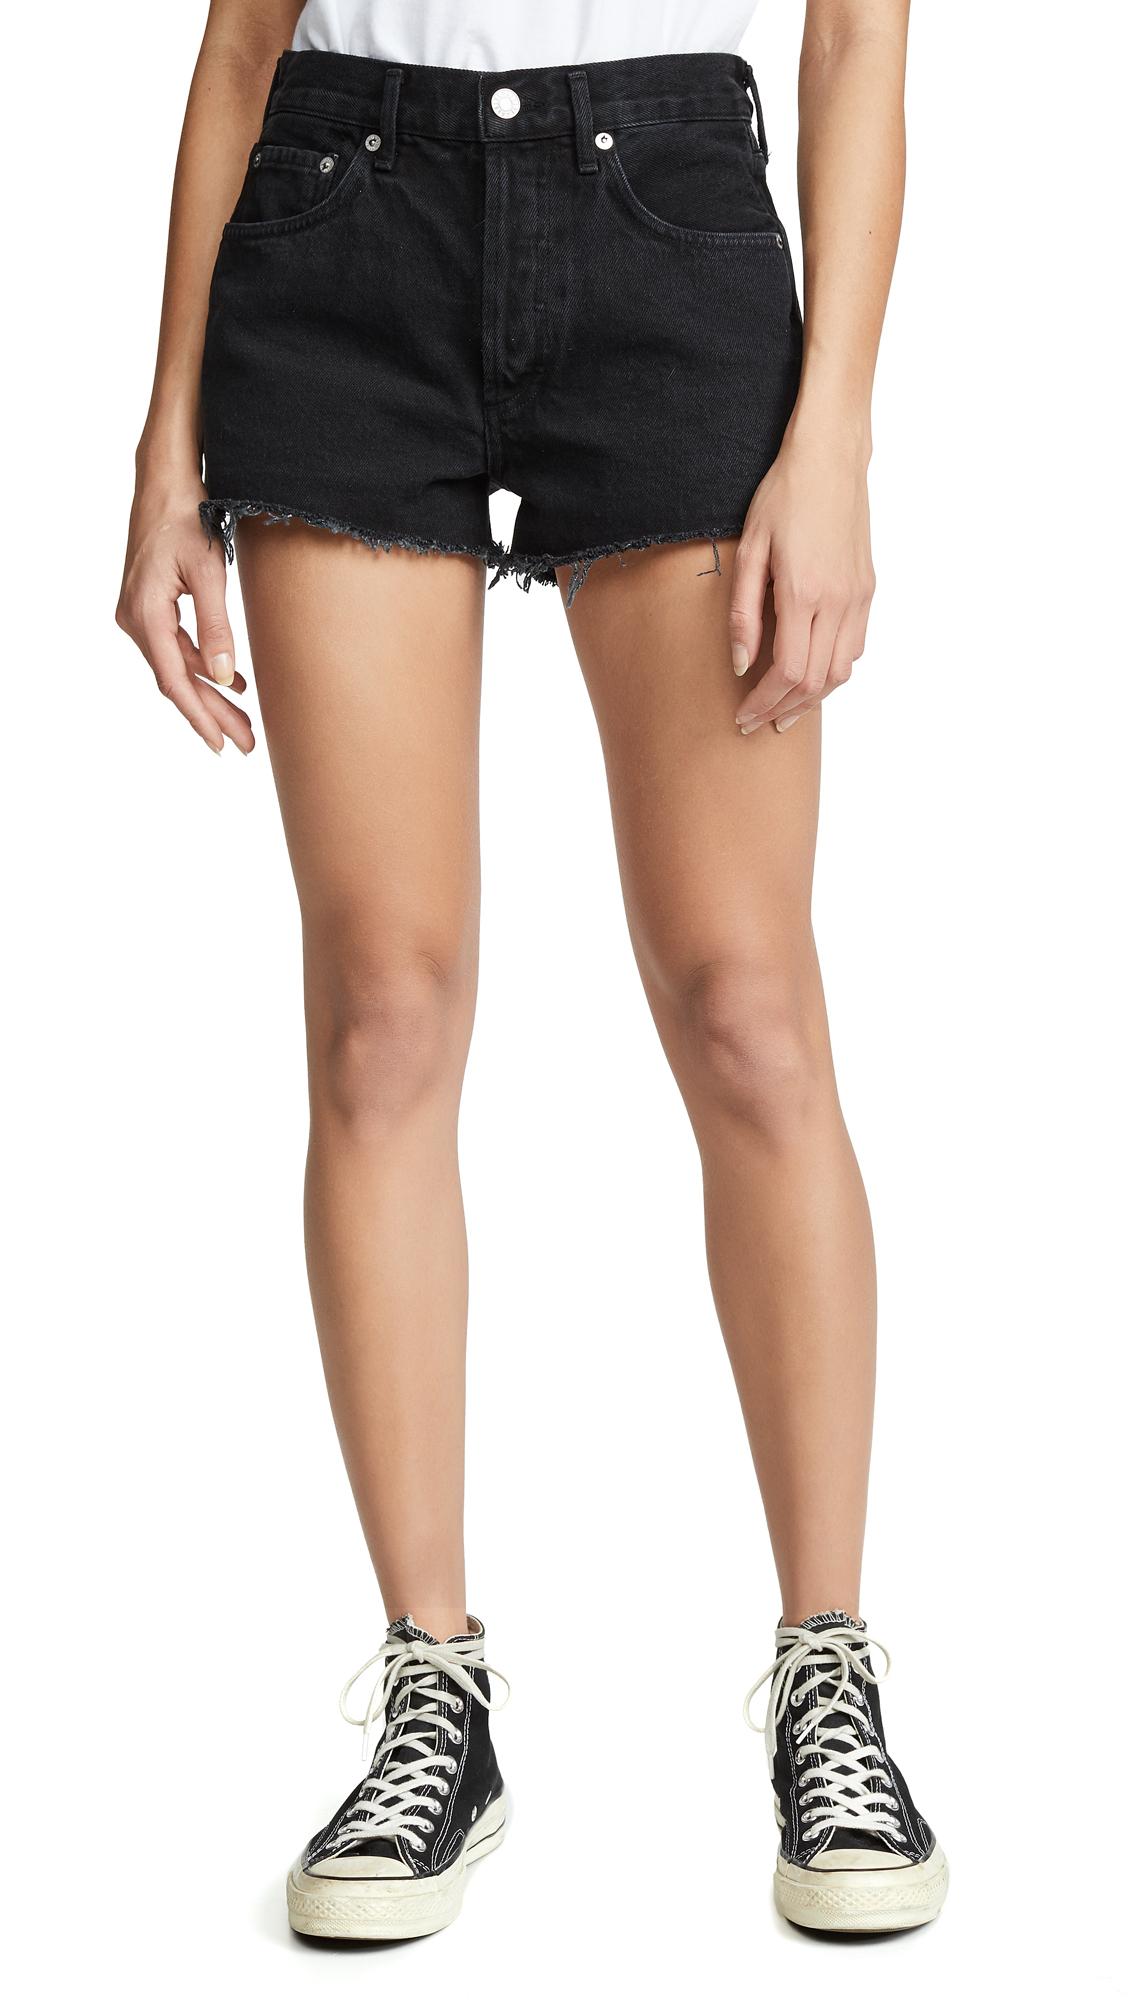 AGOLDE Vintage Cutoff Parker Shorts - Tidal